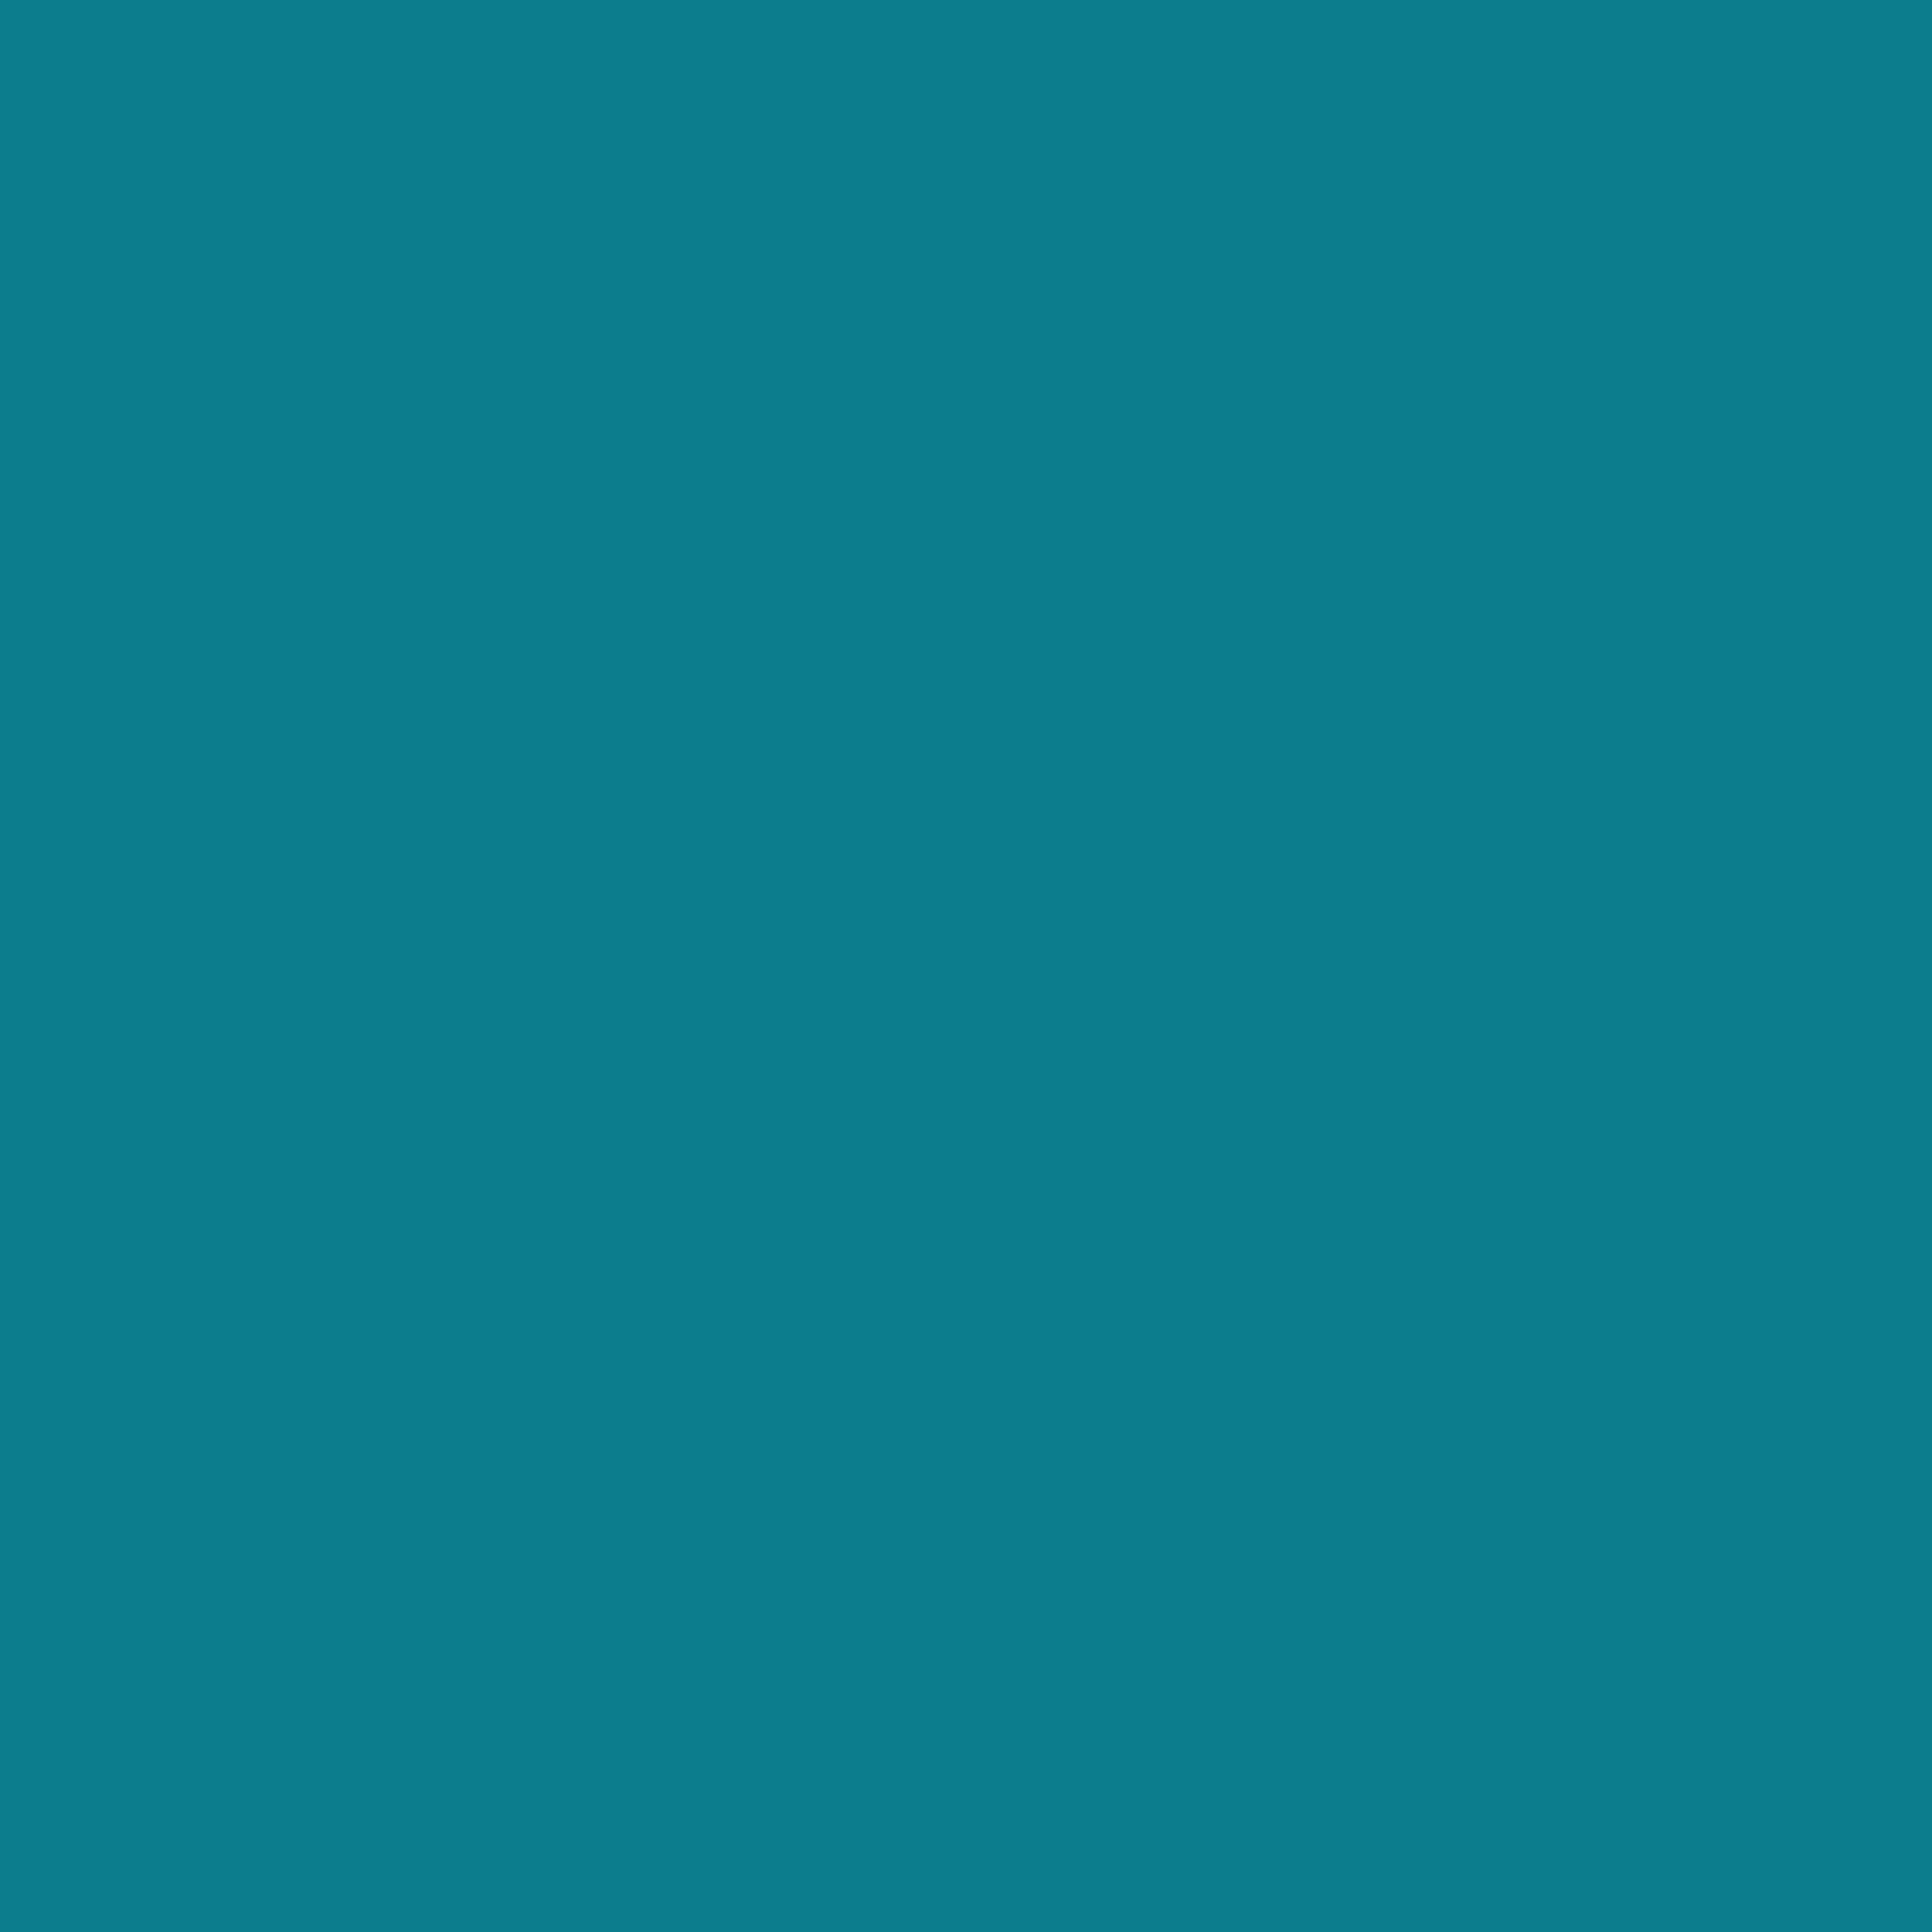 3600x3600 Metallic Seaweed Solid Color Background